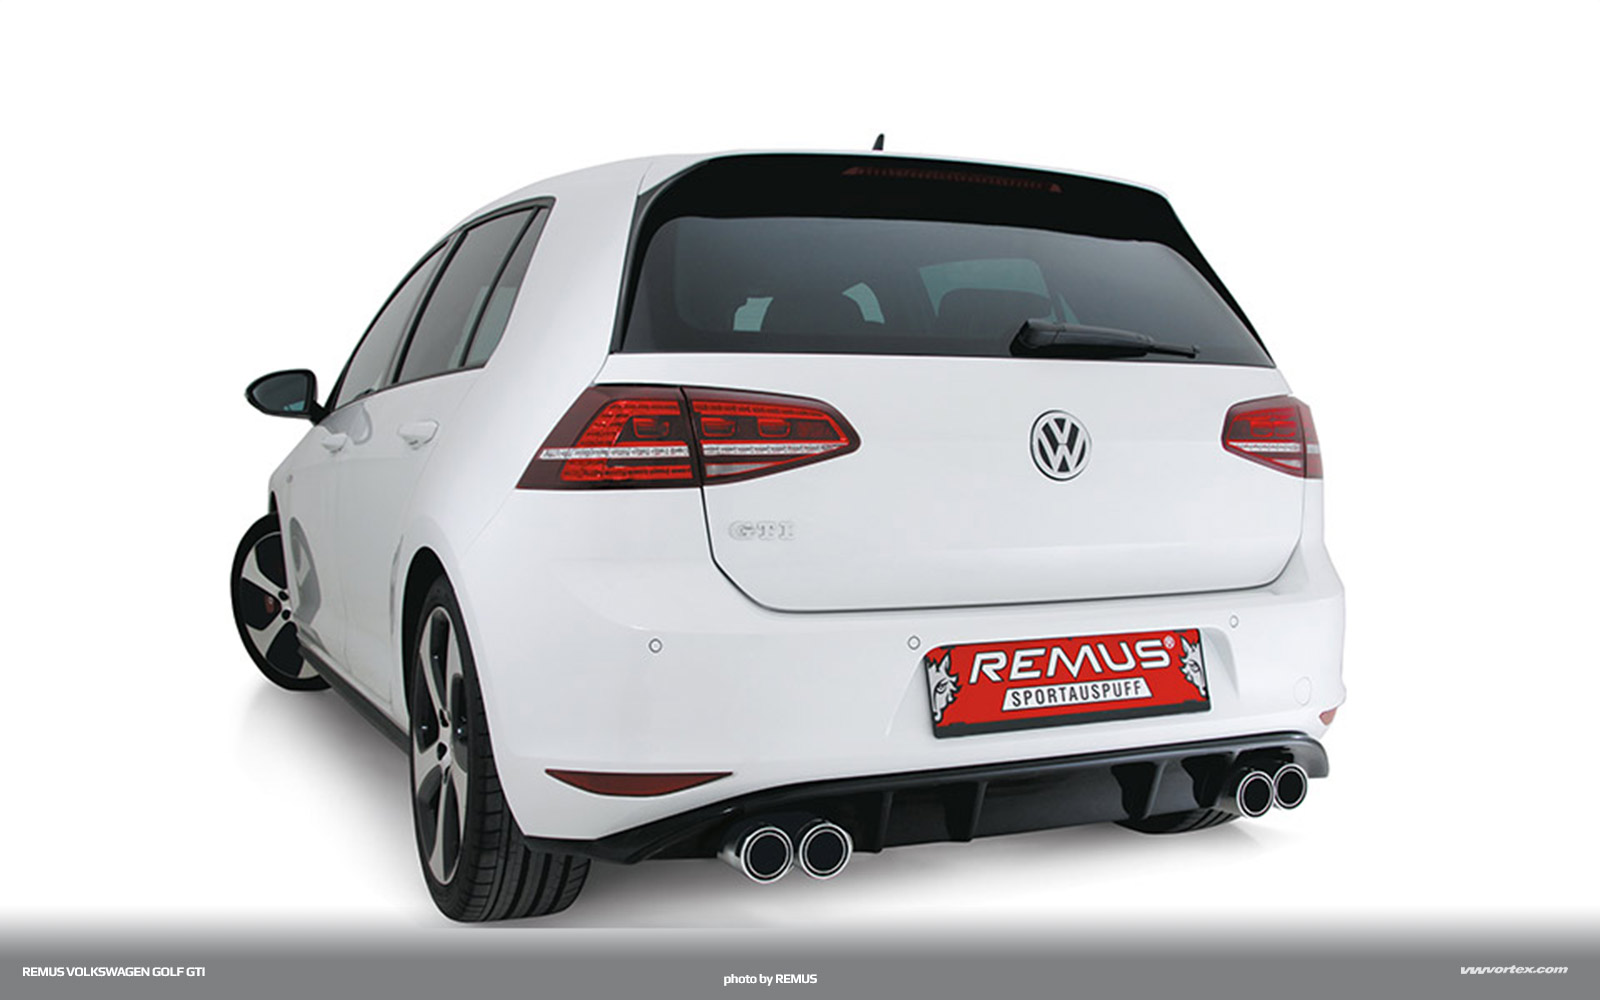 Audi Volkswagen Select Austriamicrosystems Flexray Transceiver